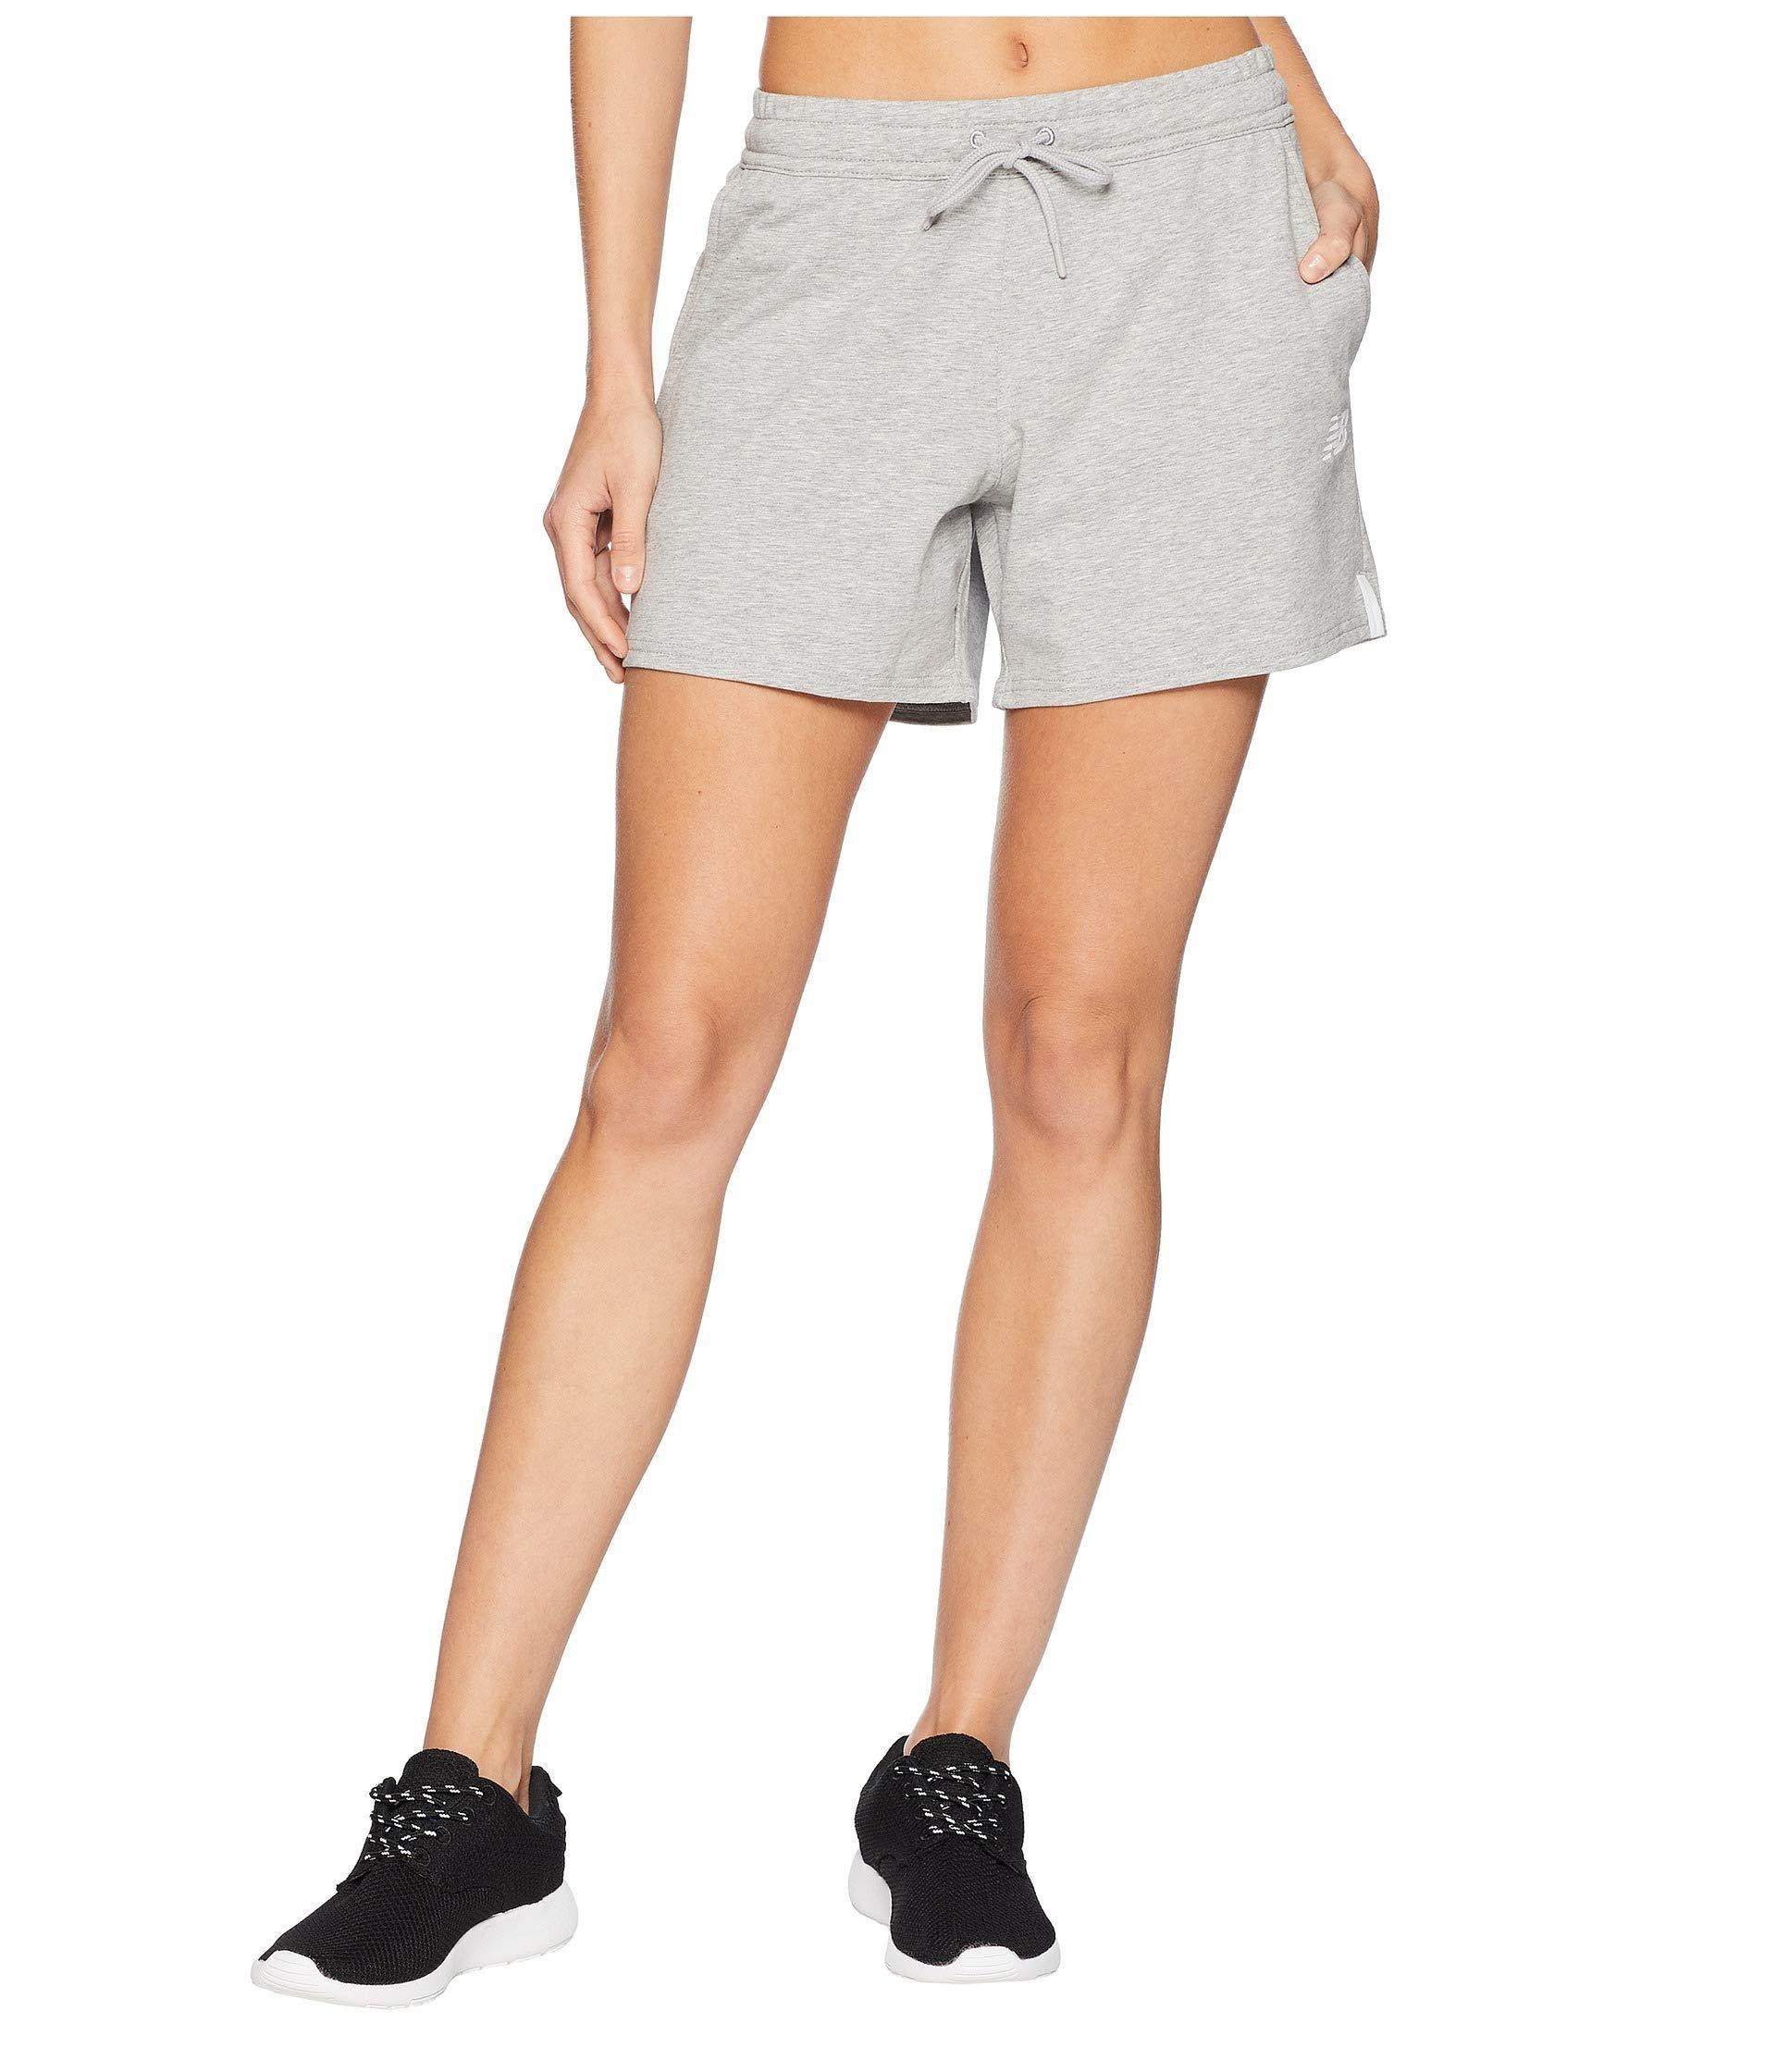 b4f674f4a048e Lyst - New Balance Nb Athletic Knit Shorts in Gray